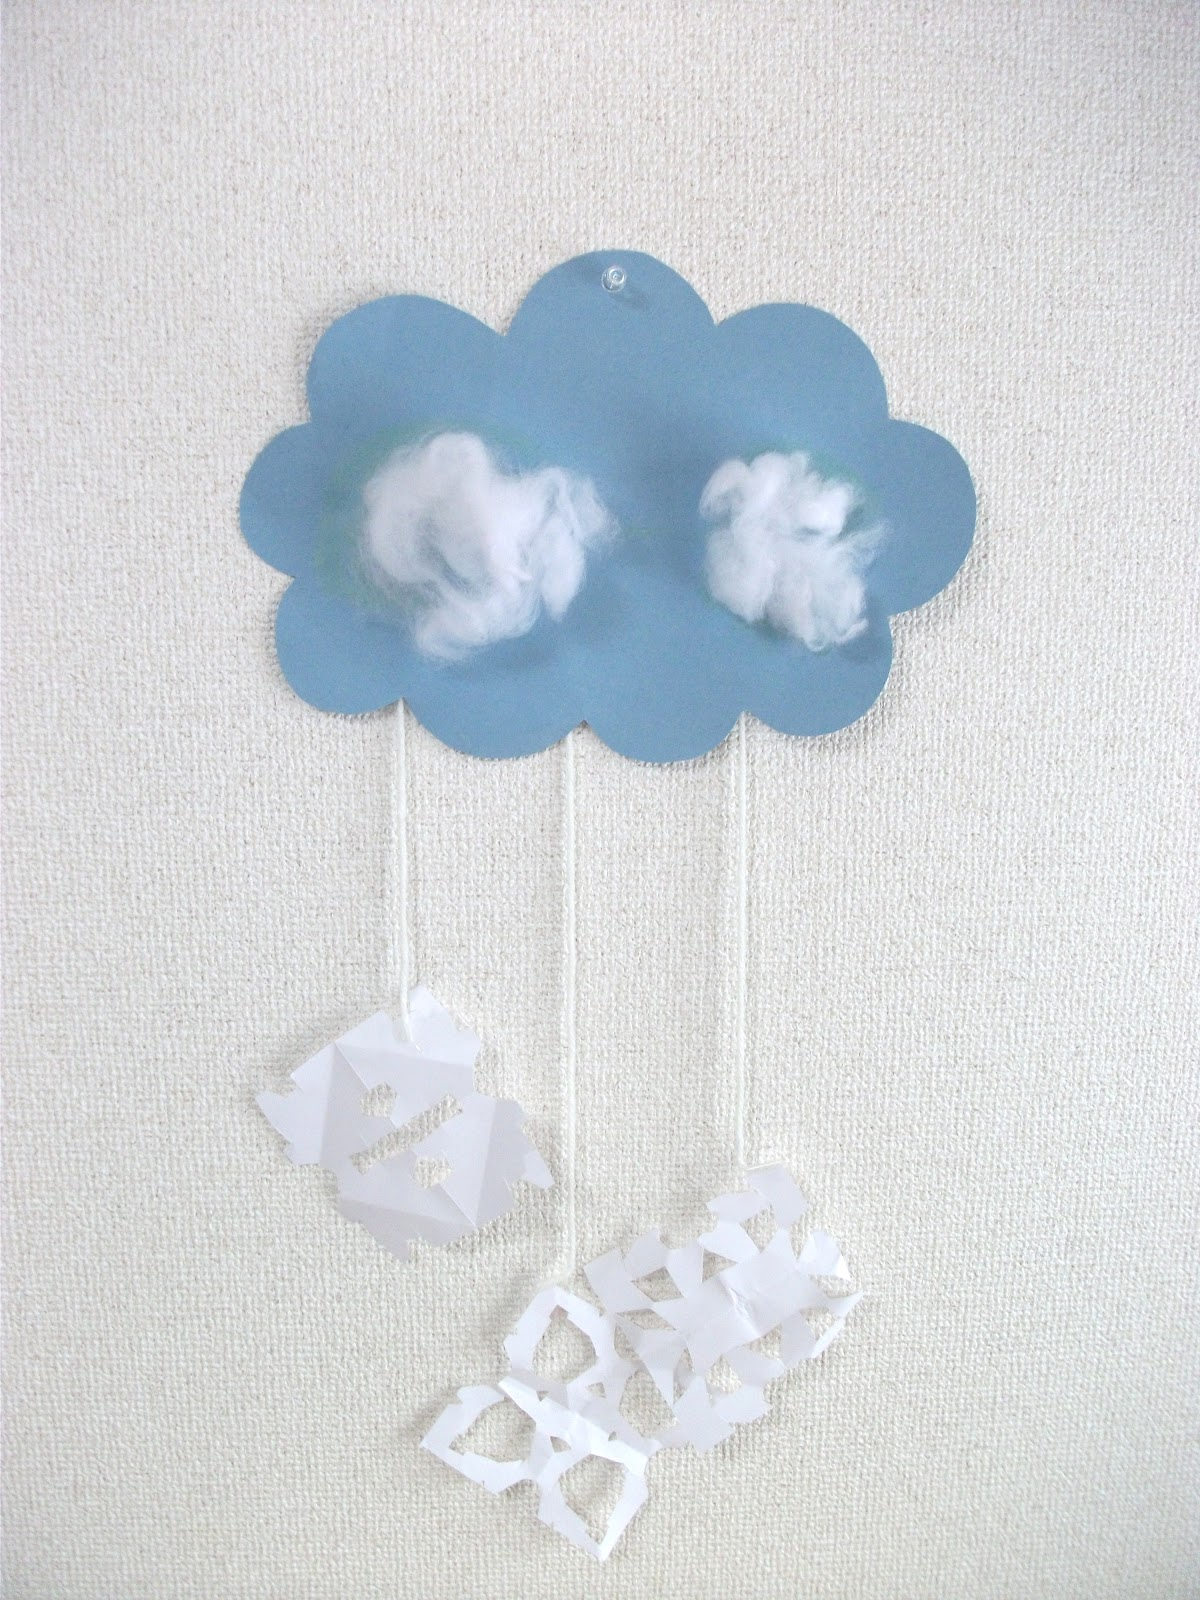 Preschool Crafts For Kids Winter Snow Cloud Mobile Craft